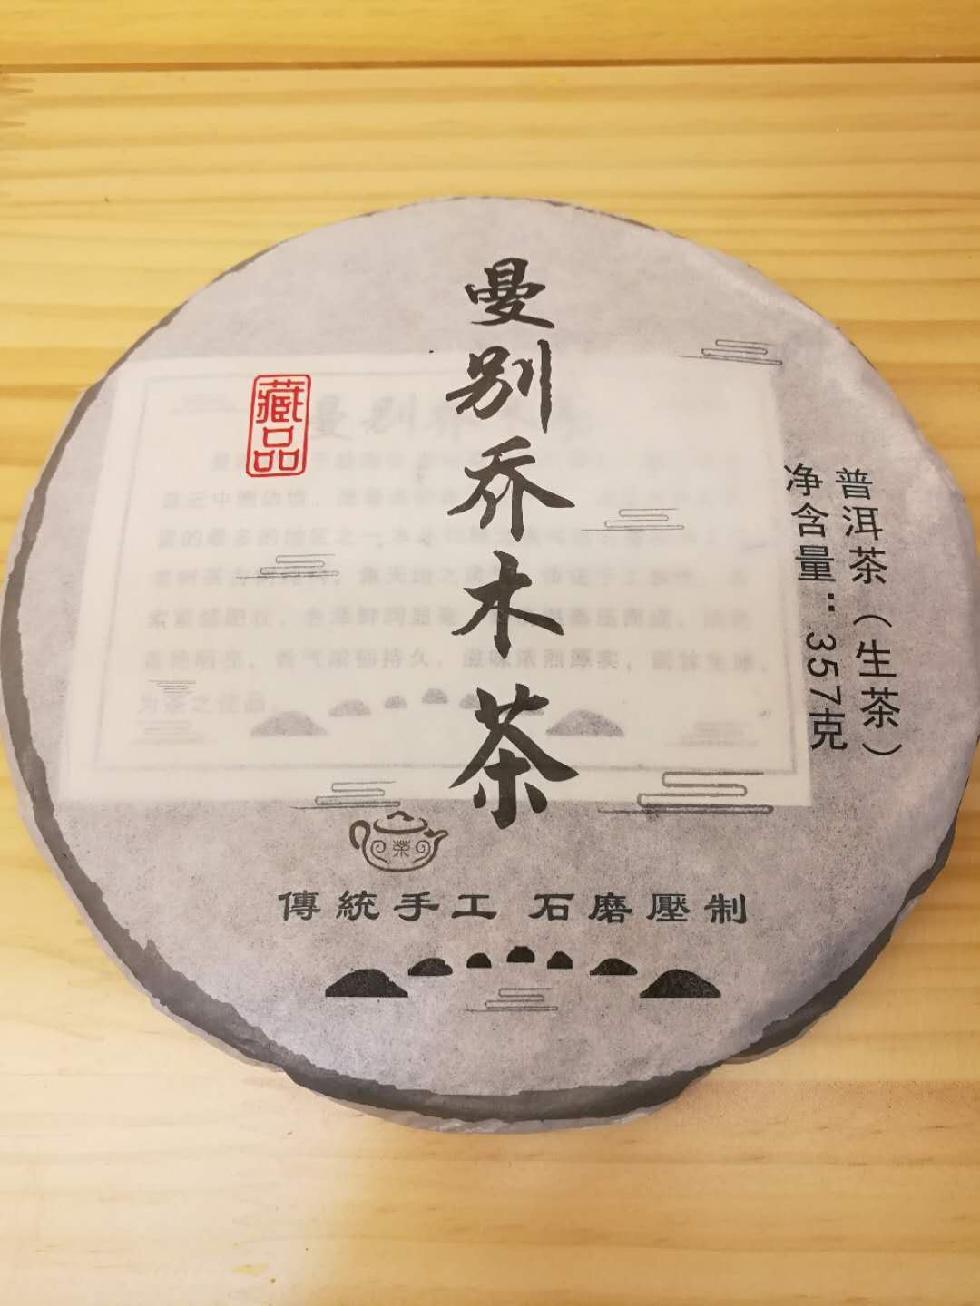 Raw Pu'er tea cake of the year 2017